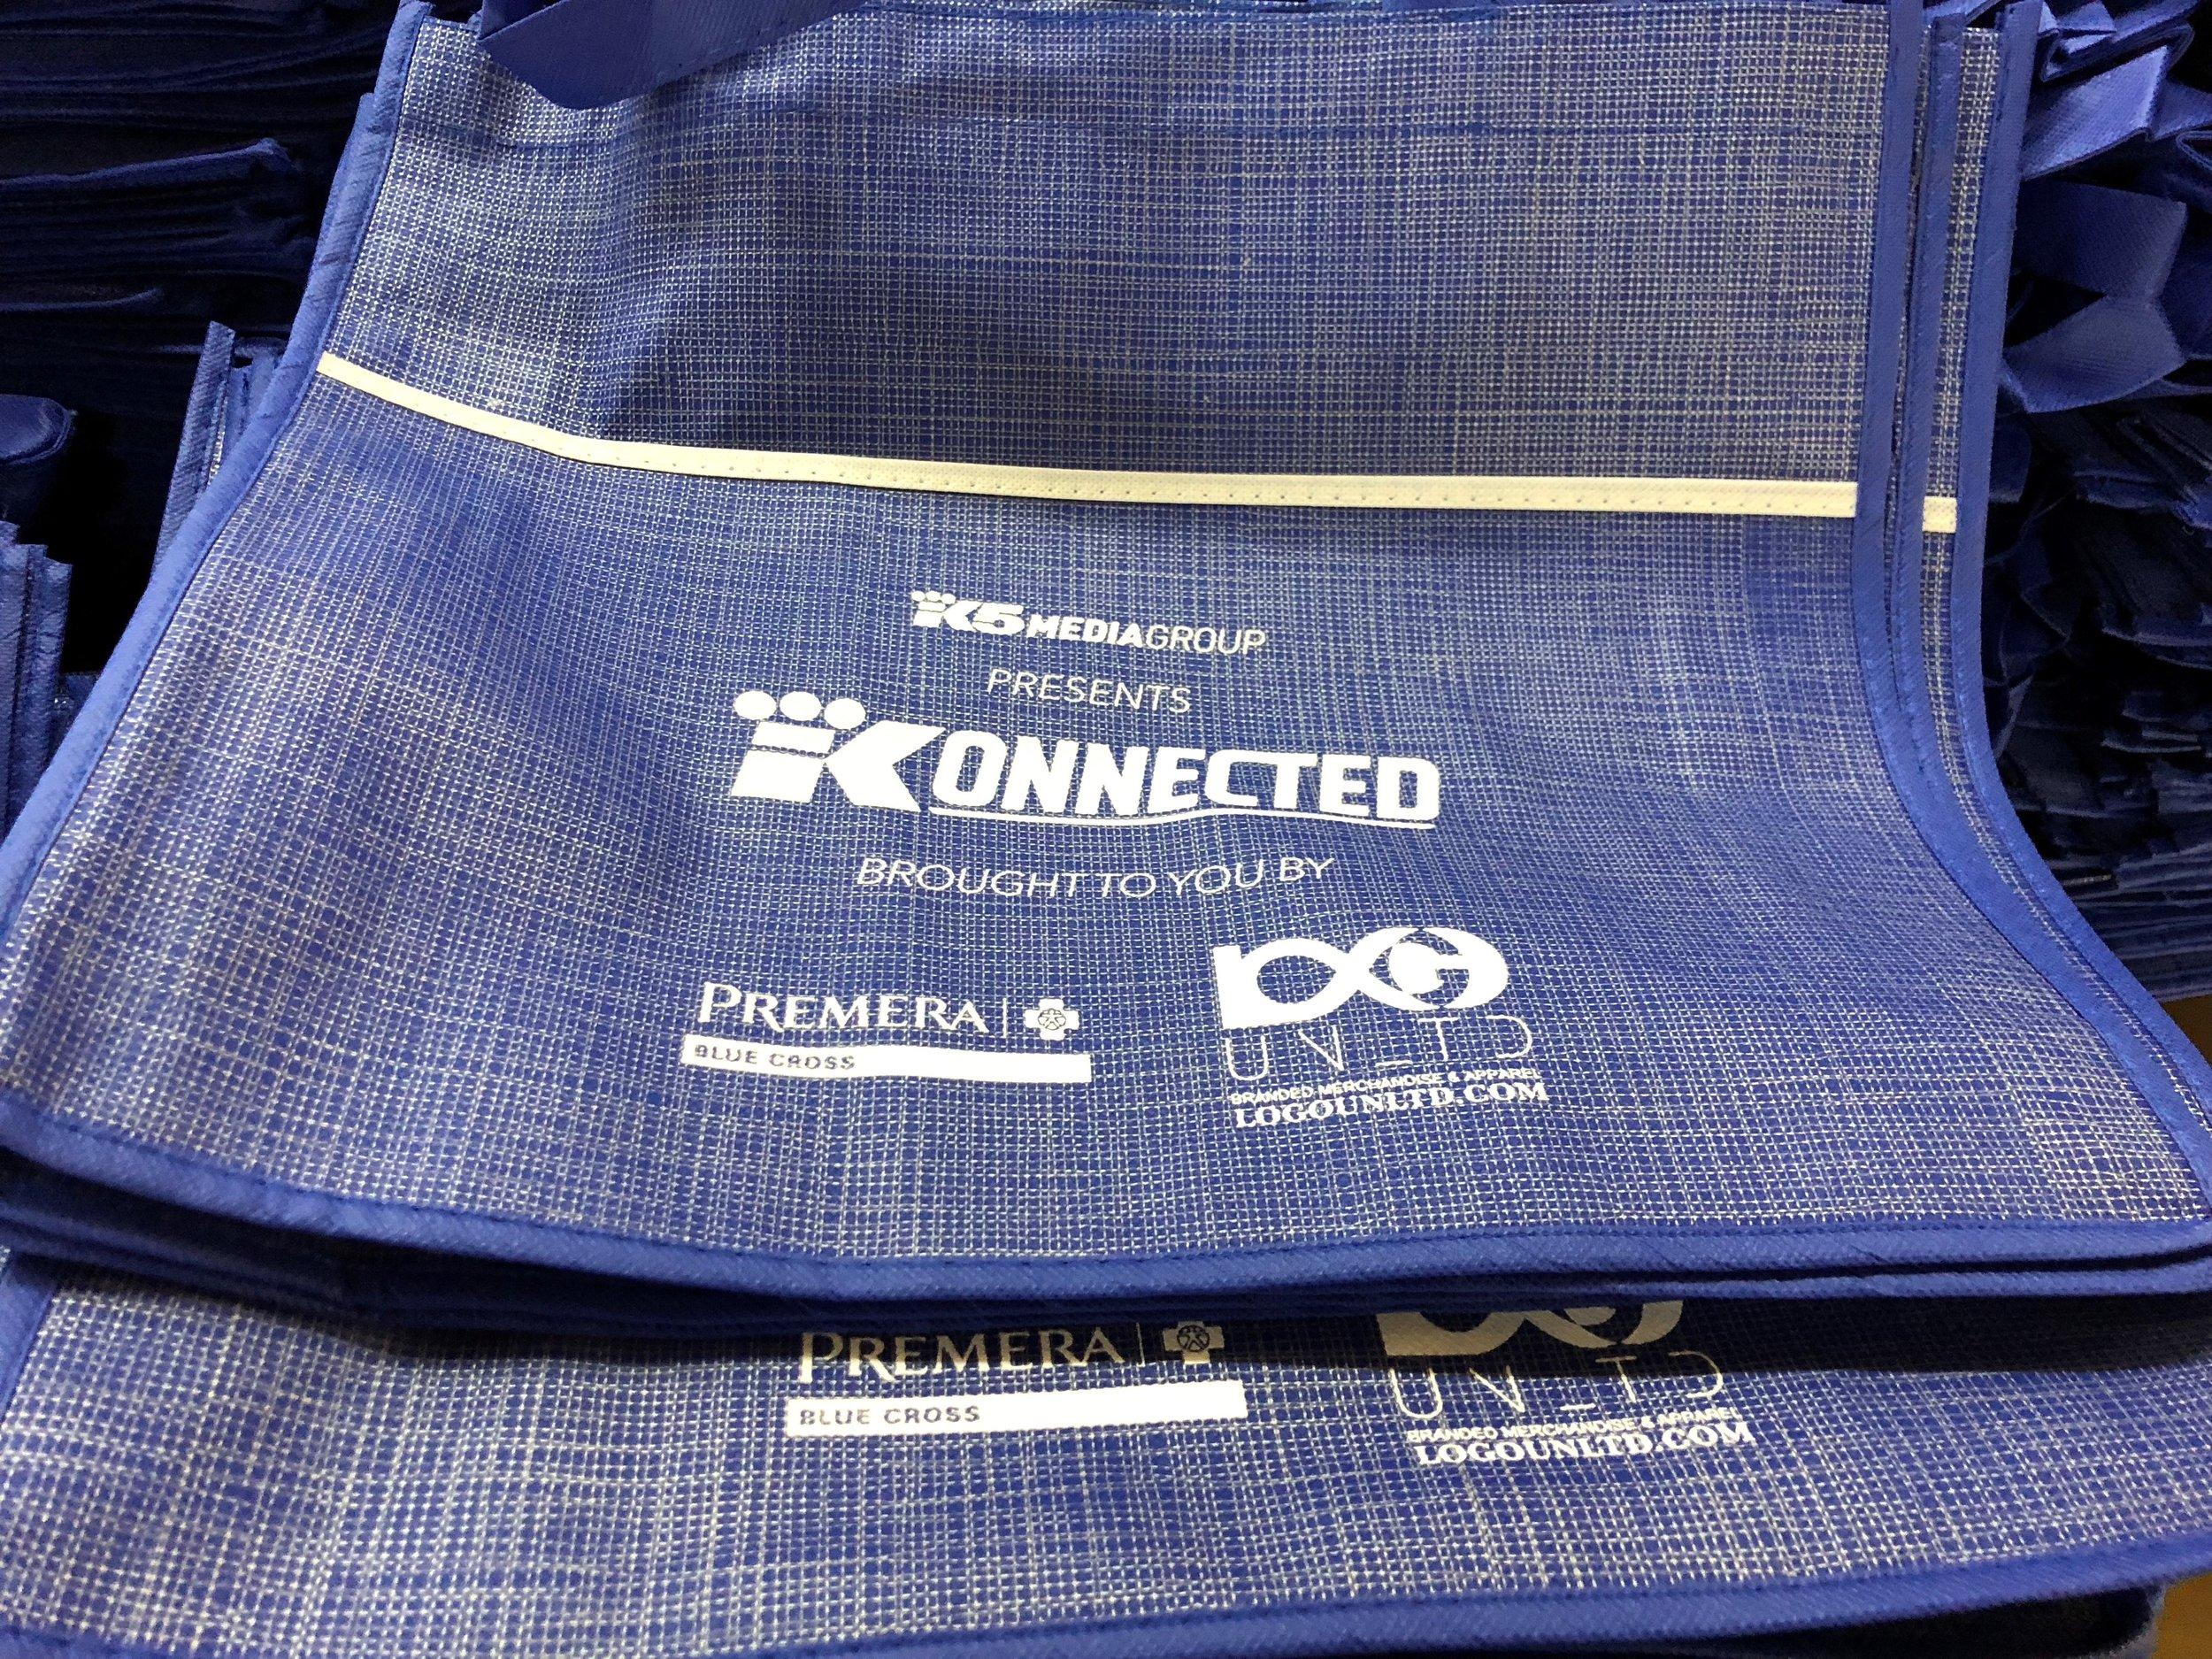 logounltd_laser_etching_embroidery_screen_printing_corporate_apparel_uniform_custom_tshirts_uniforms_dye_sublimation_kirkland_bellevue_seattle_redmond_branded_merchandise_promotional_products (22).jpg